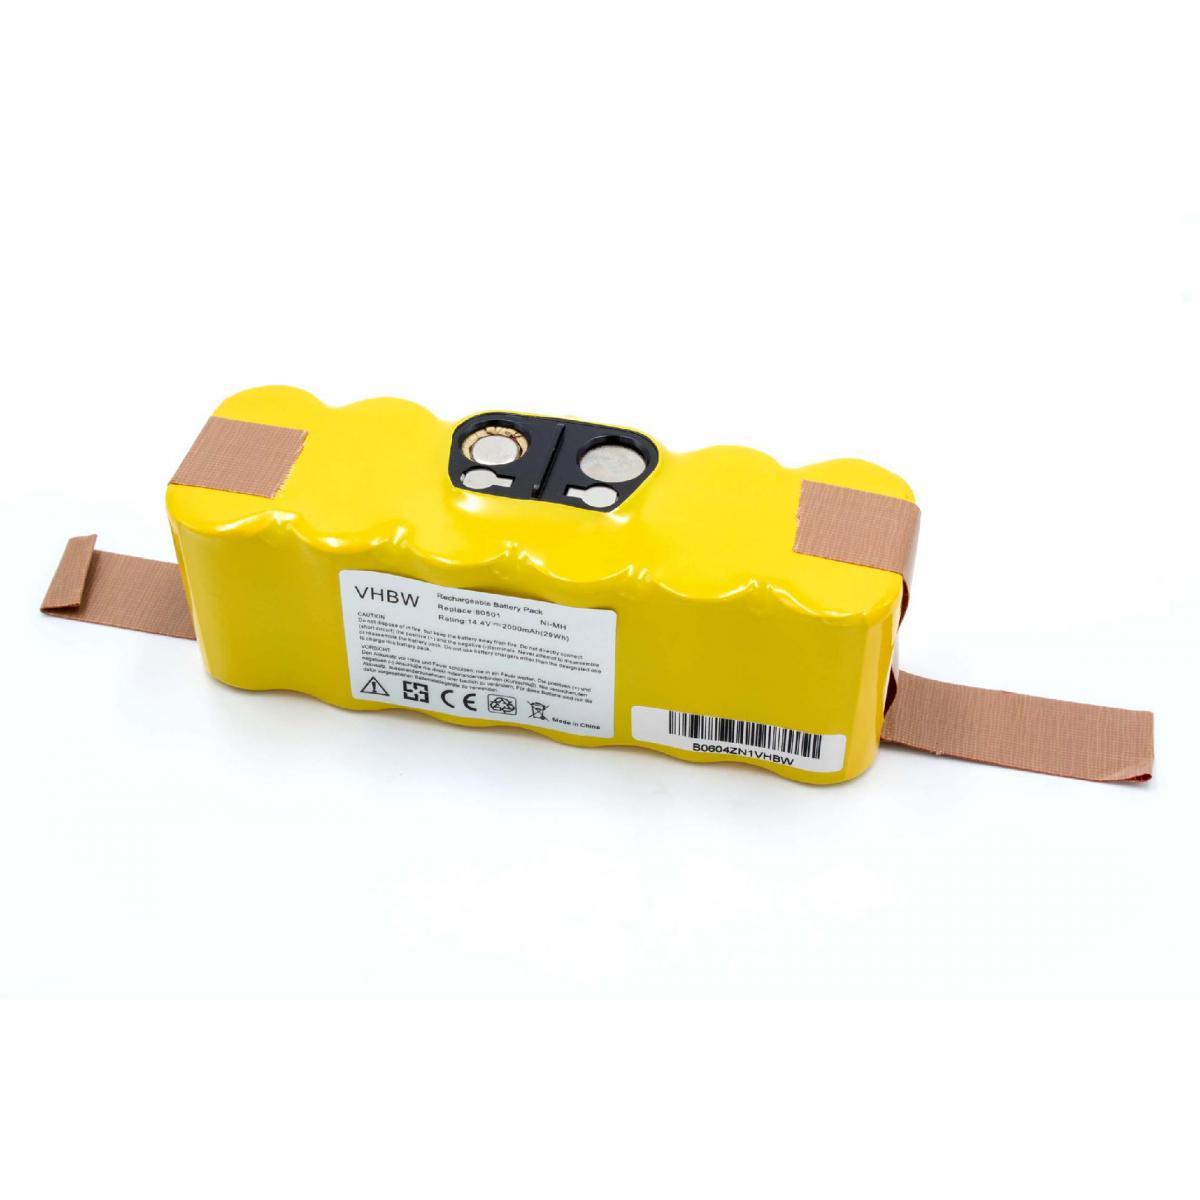 Vhbw vhbw® Batterie de rechange NiMH 2000mAh (14.4V) compatible avec iRobot Roomba des séries 500, 600, 700, 800, 900